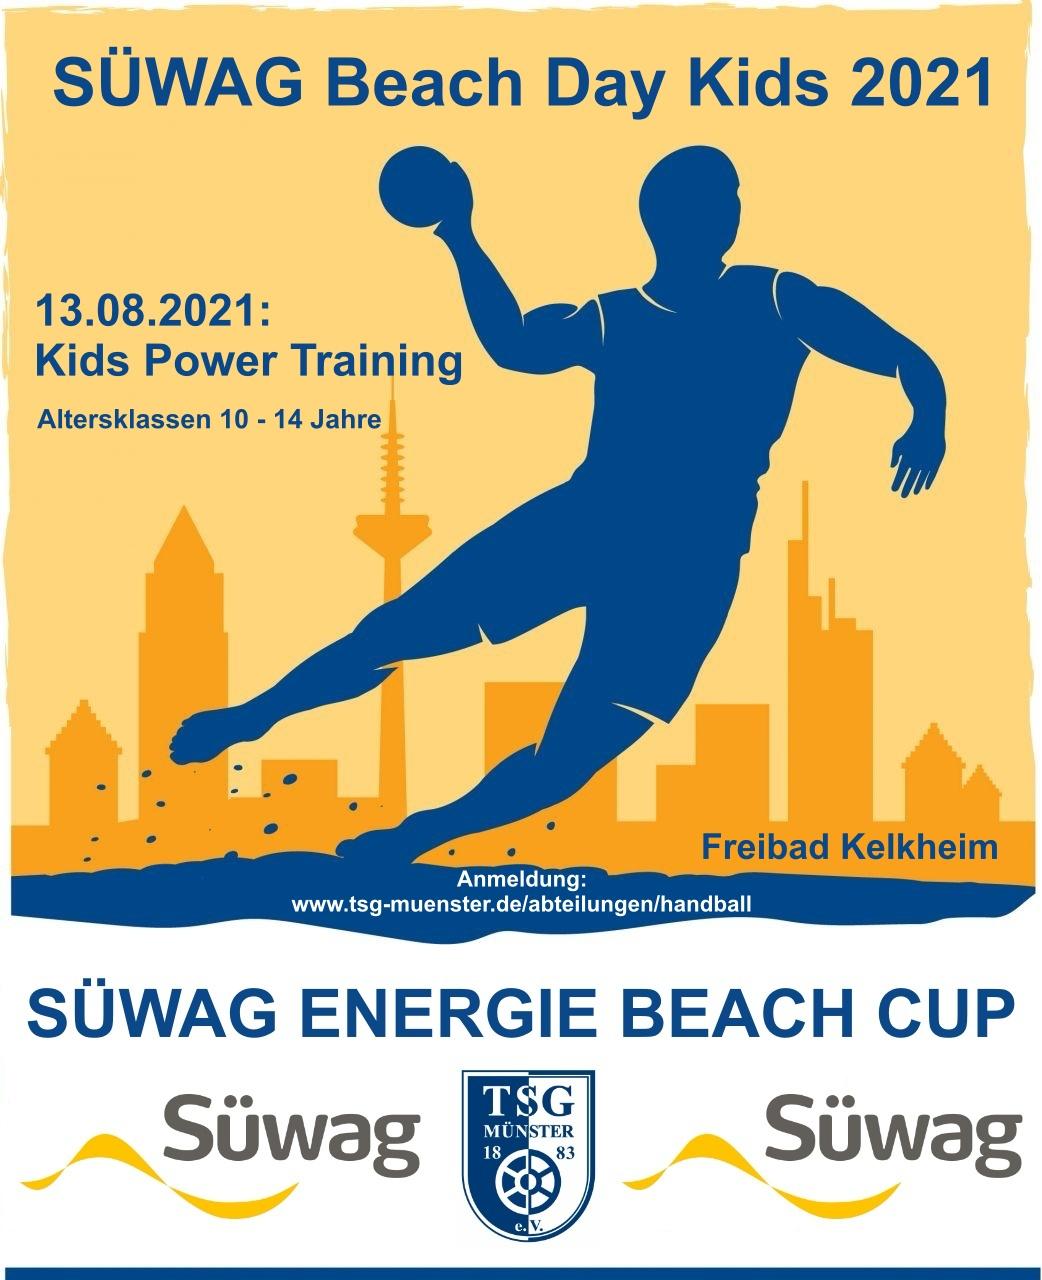 2021-07-19 Süwag Beach Day Kids 2021